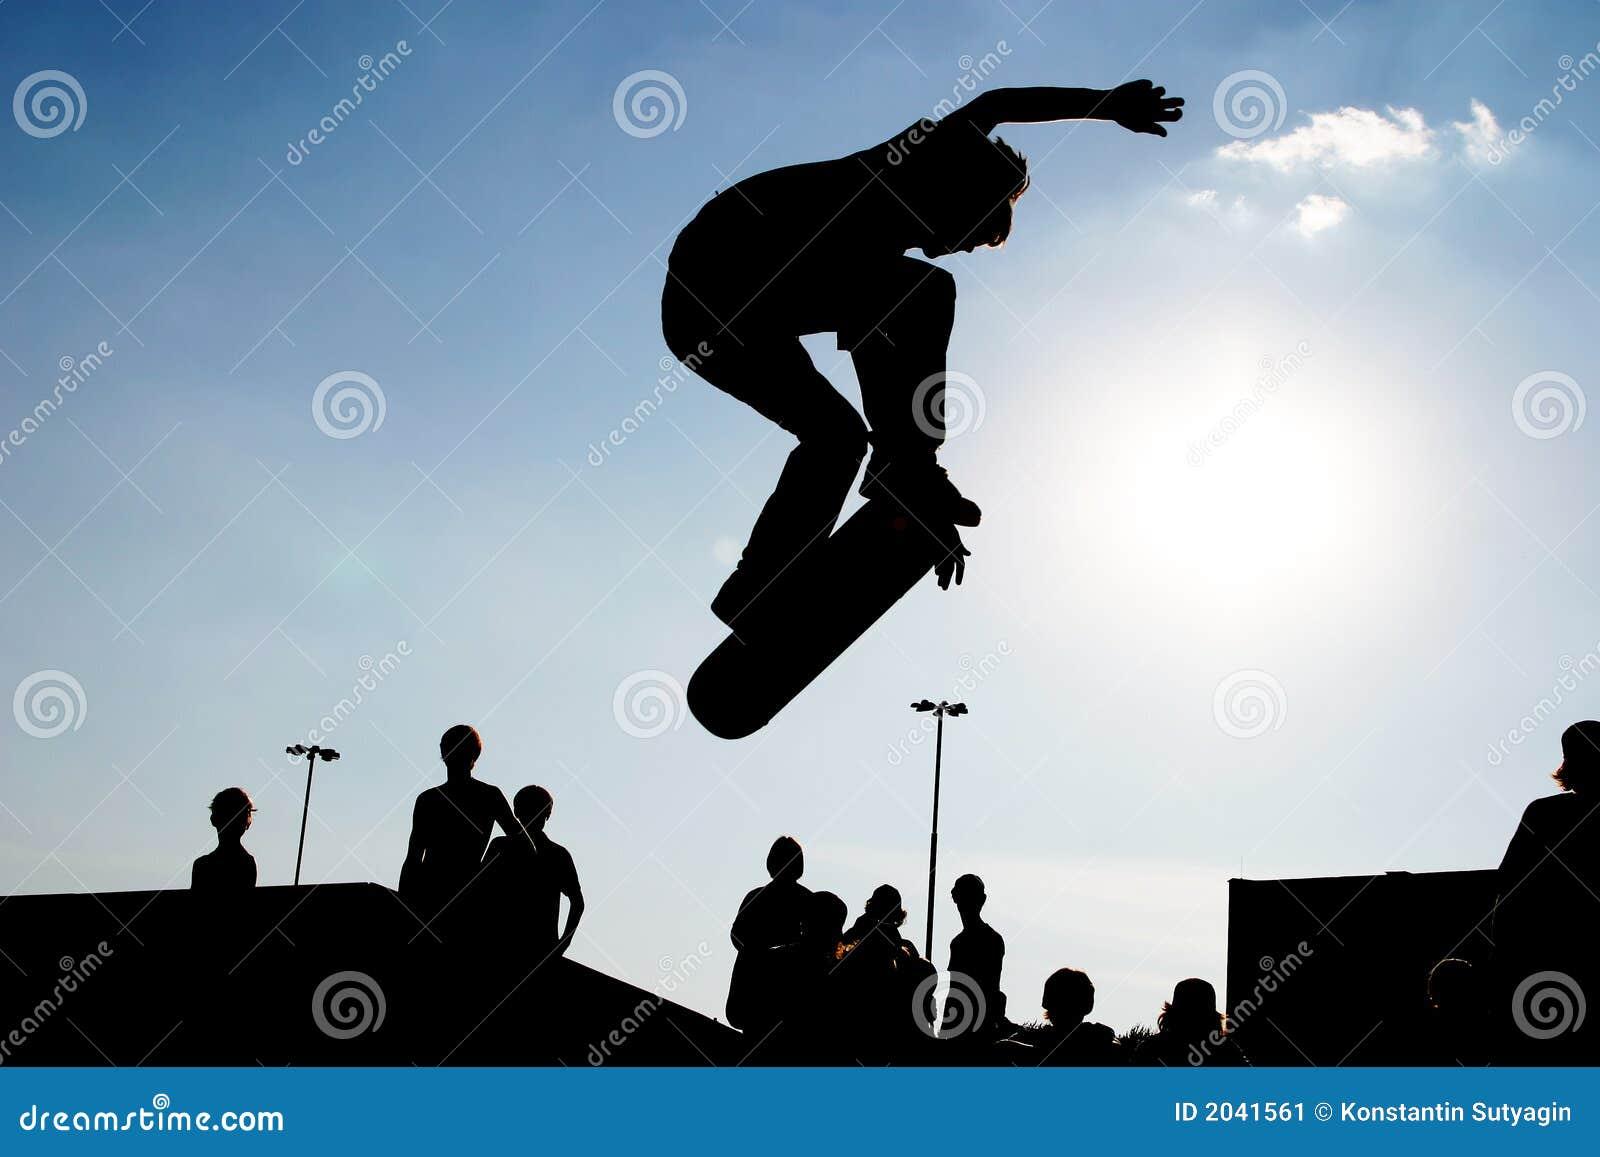 Skateboarder  definition of skateboarder by The Free